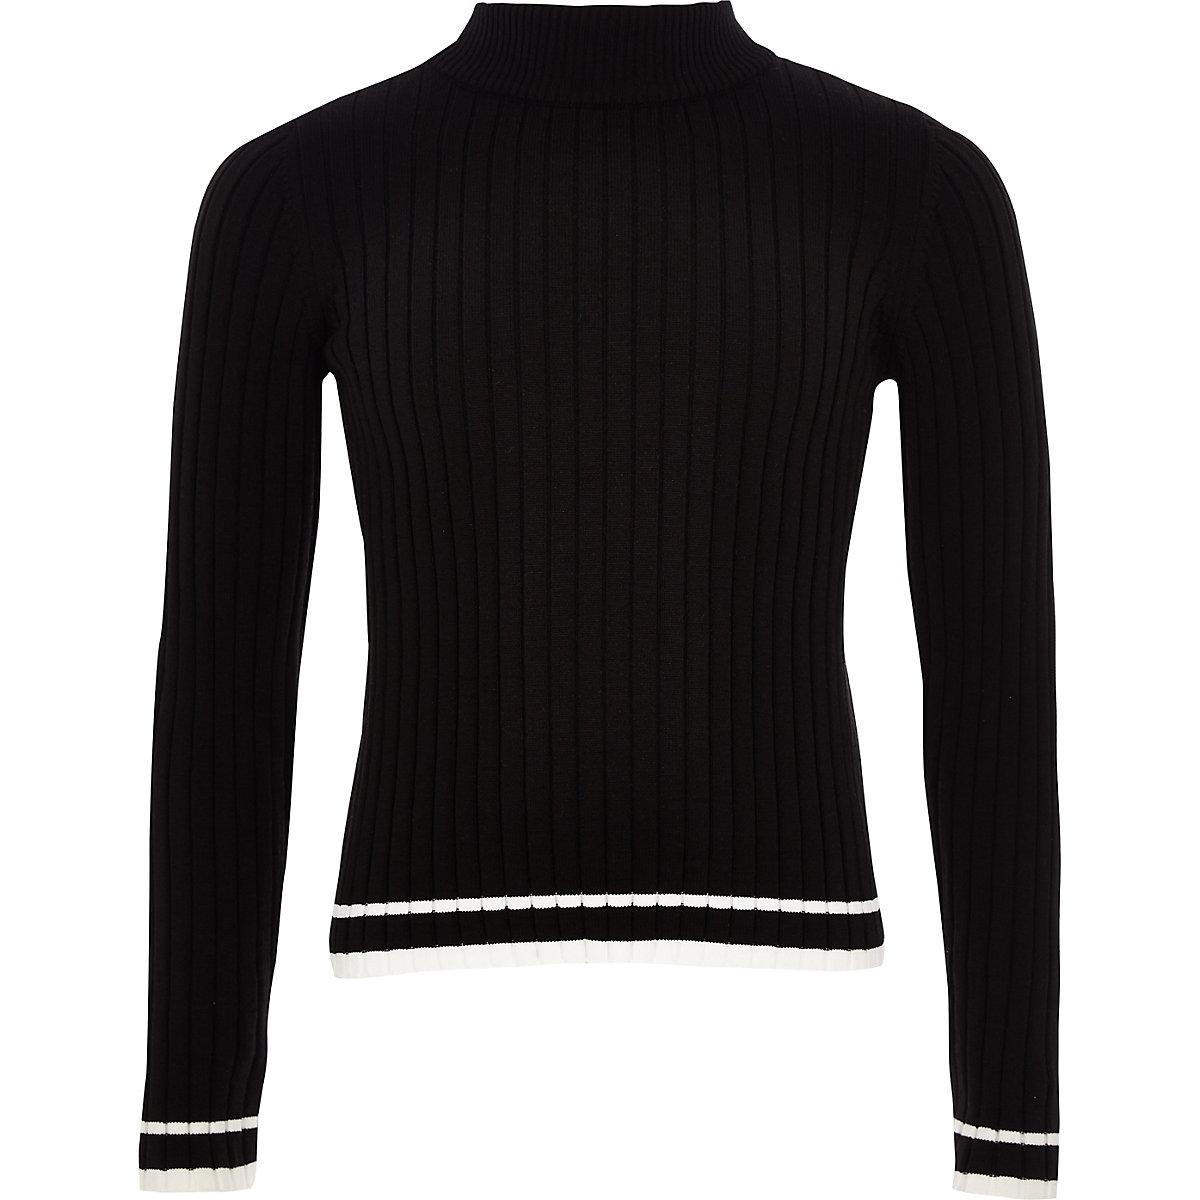 Girls black rib tipped sweater